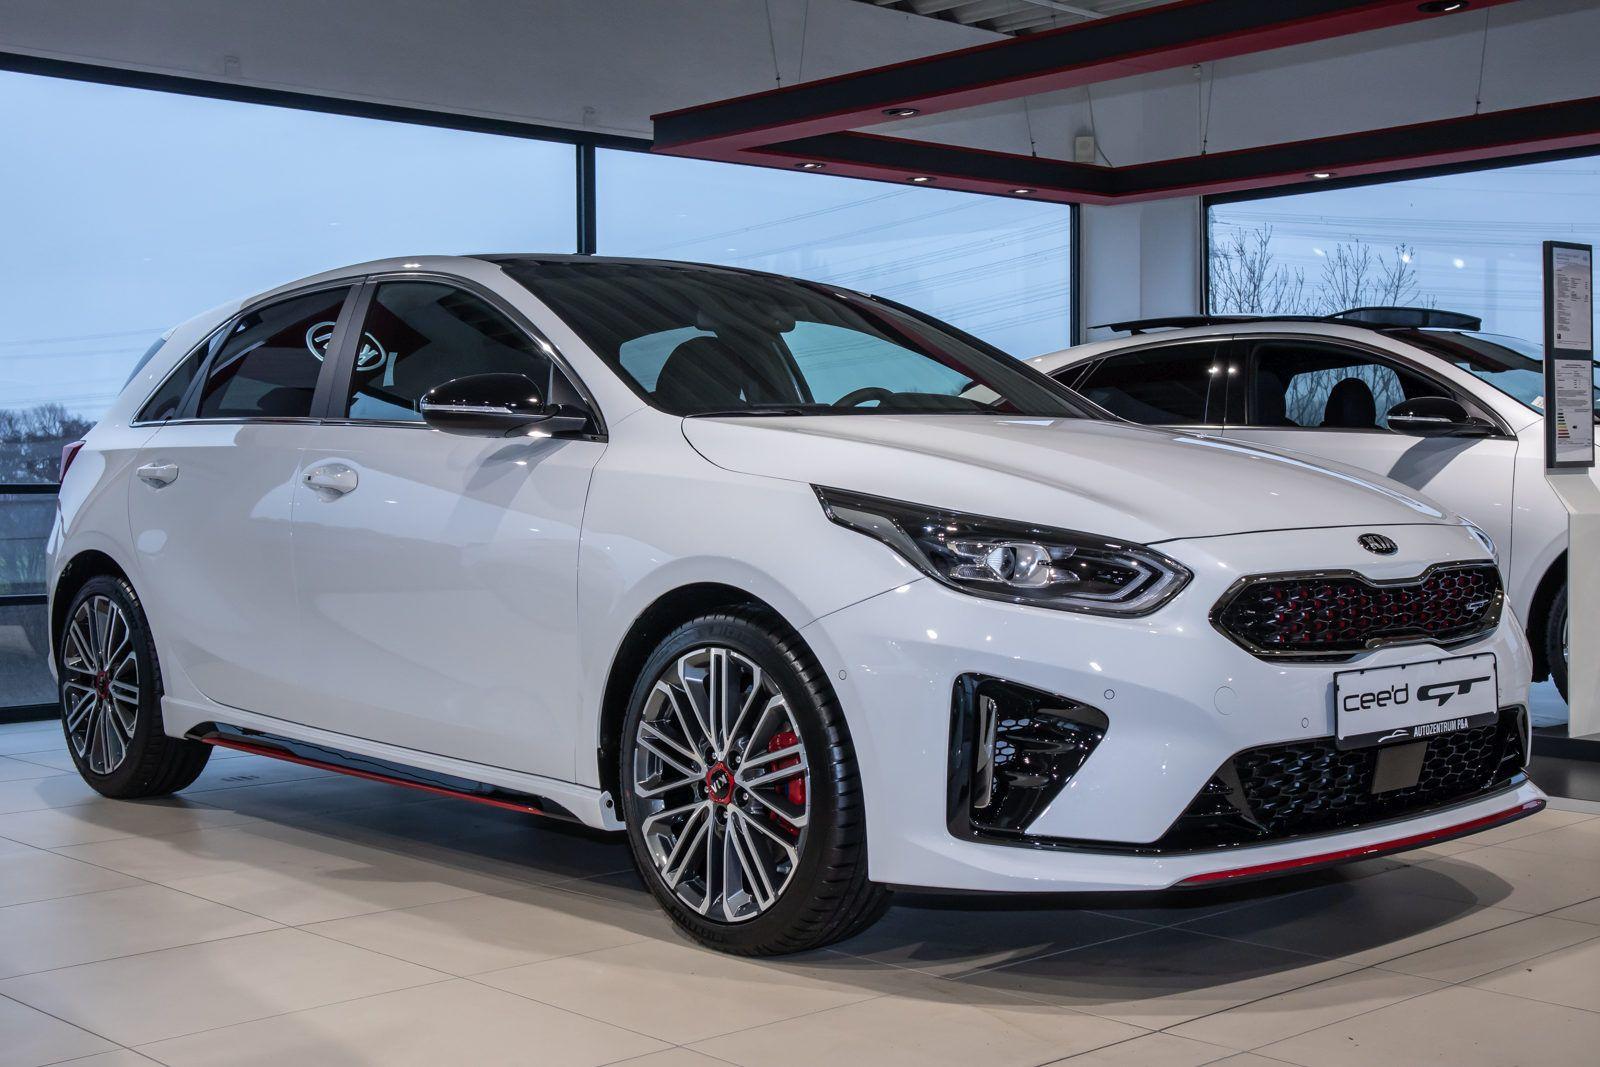 Kia Ceed Gt Autos Fahrzeuge Angebote